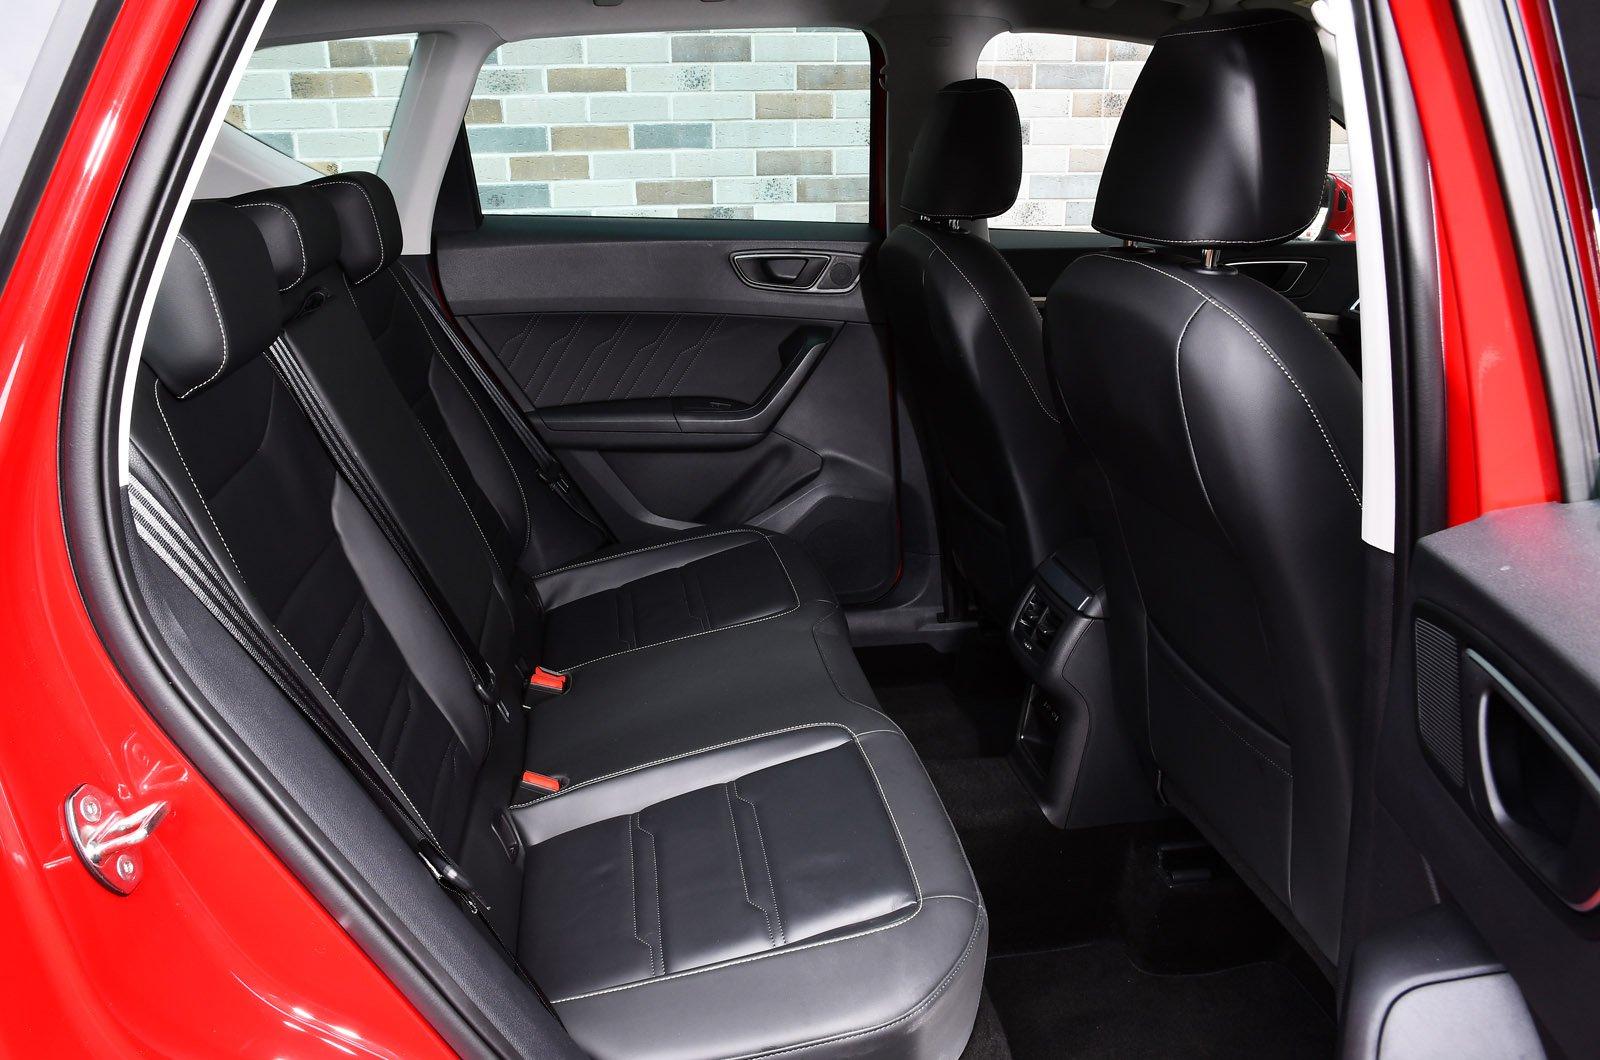 Seat Ateca 2021 rear seats